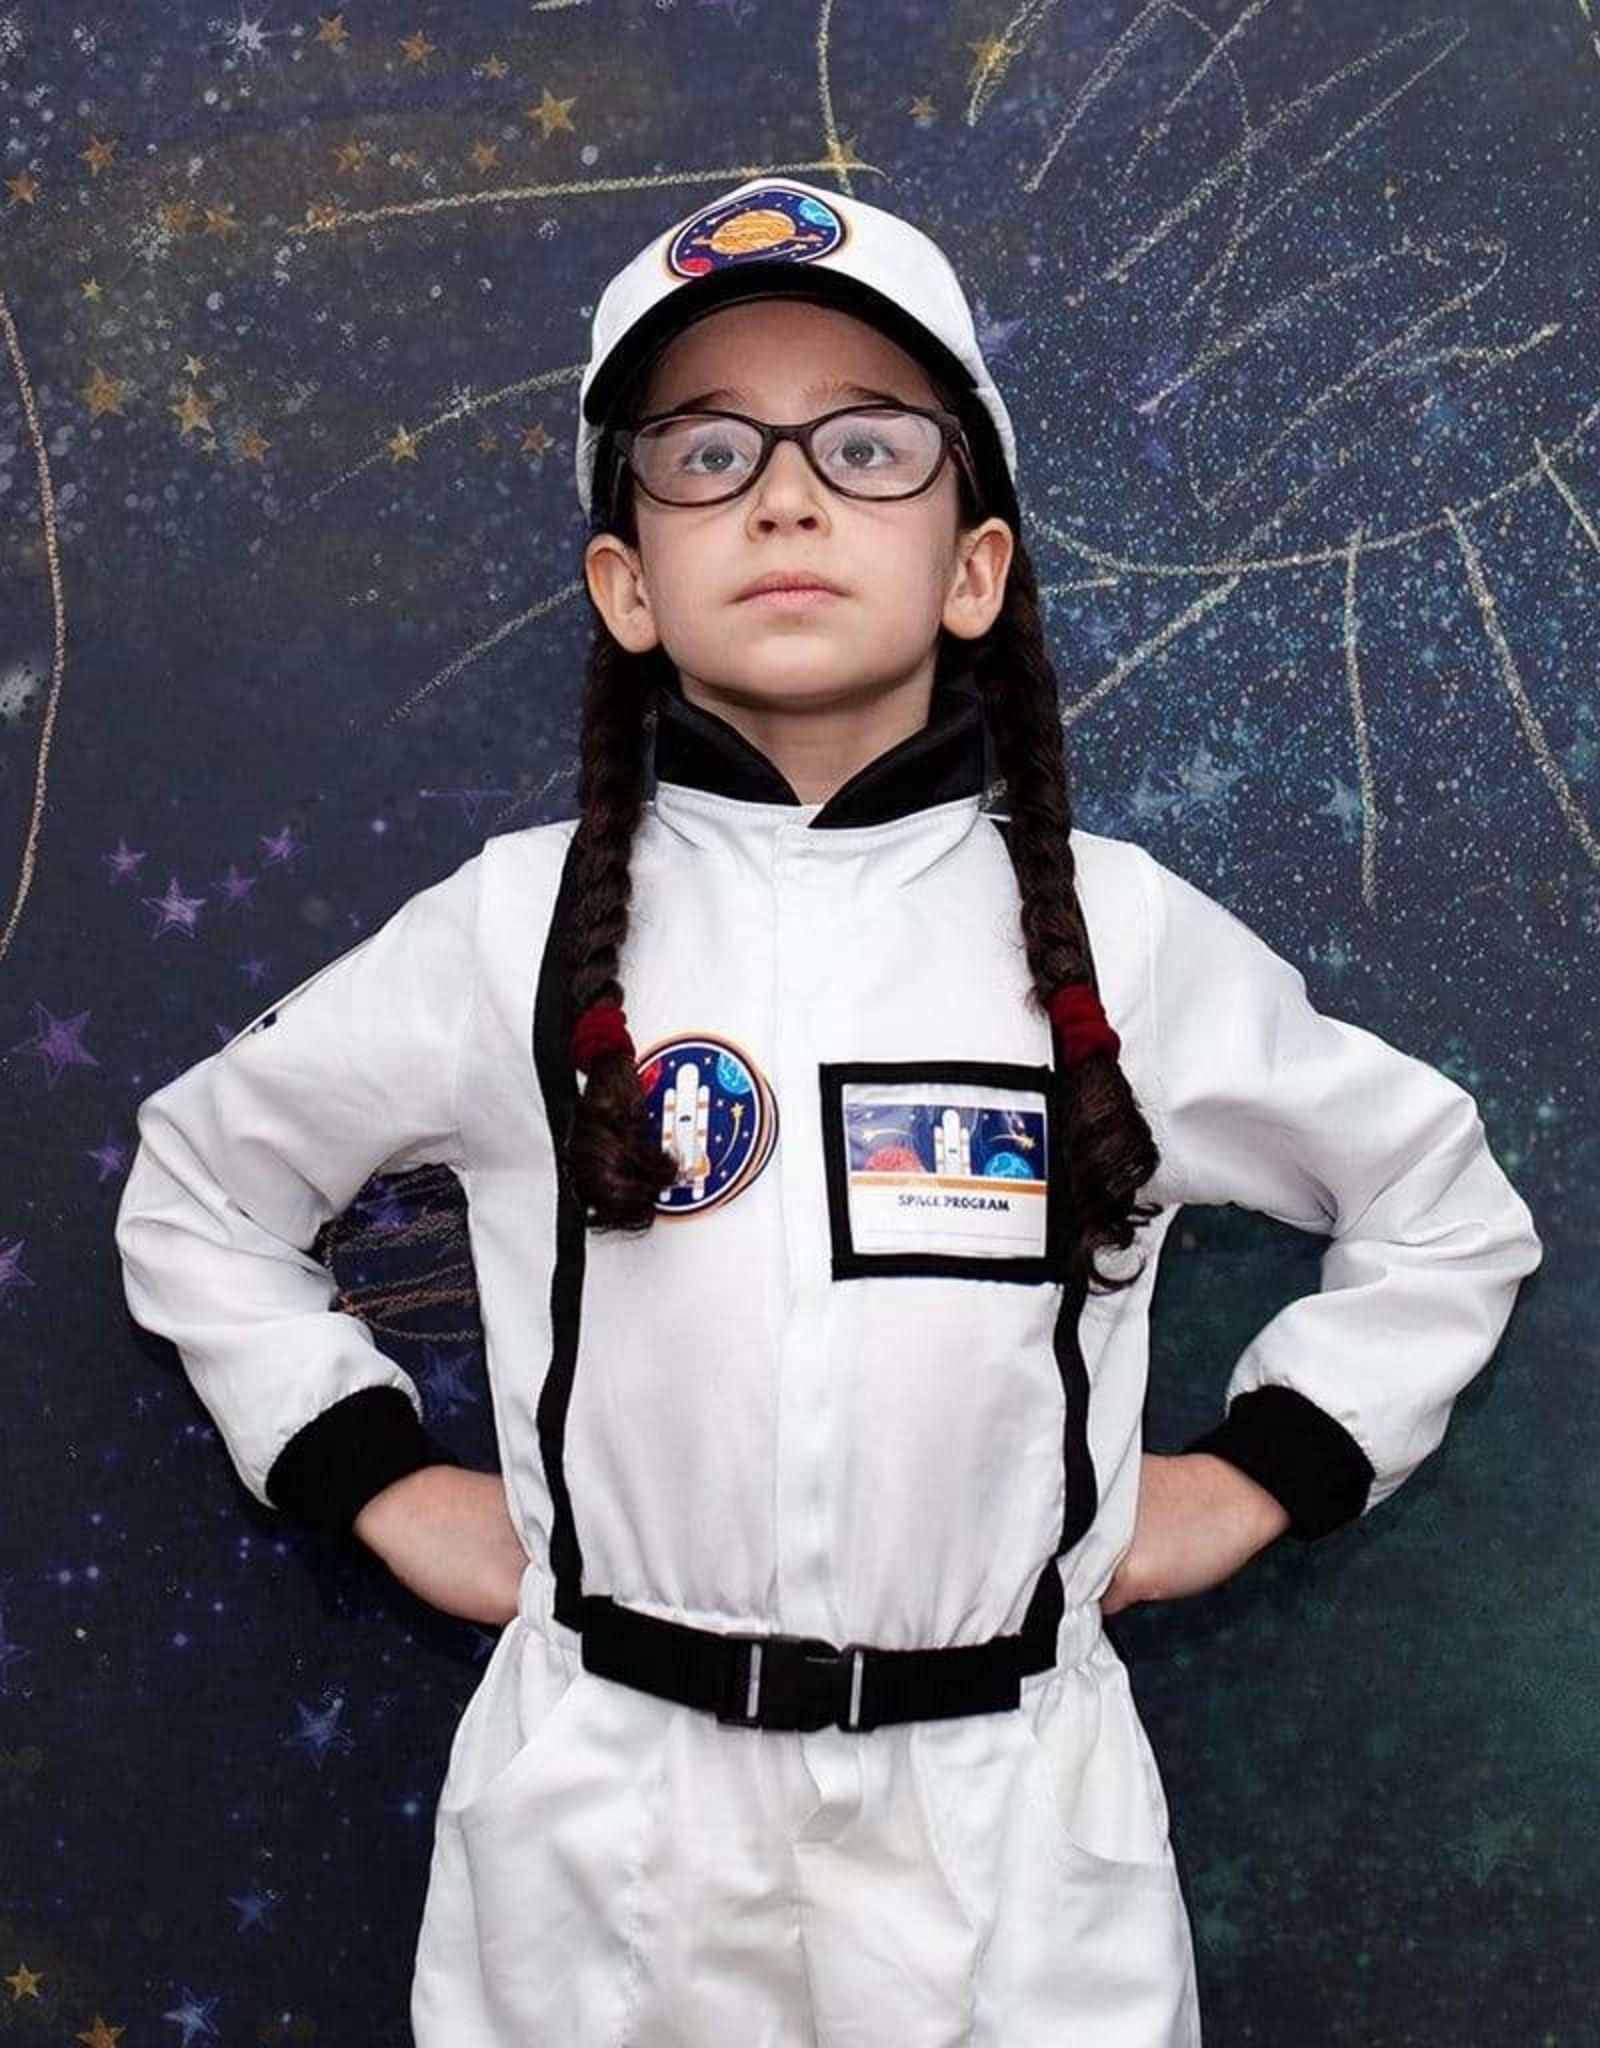 Great Pretenders Great Pretenders Astronaut Role Play Costume